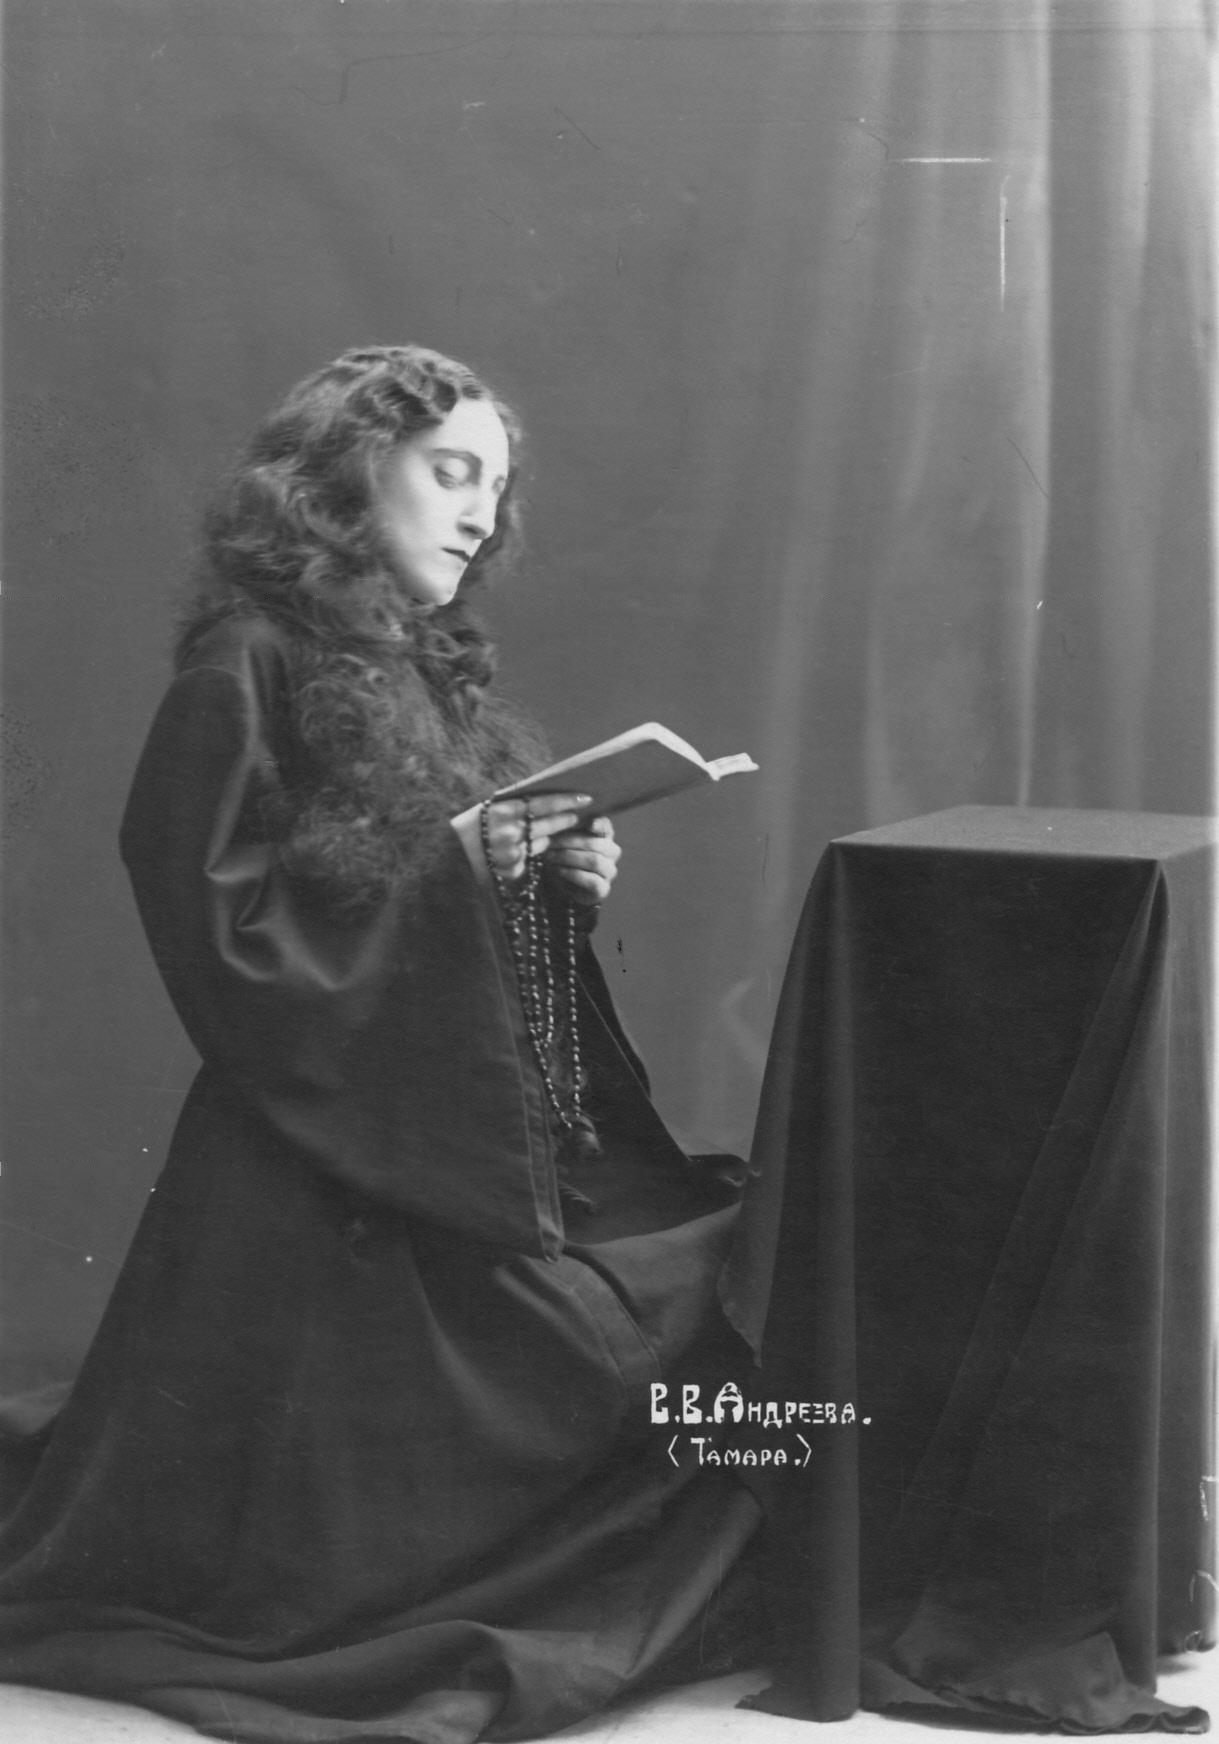 Андреева Валентина - артистка театра в роли Тамары из оперы «Демон» А. Г. Рубинштейна.